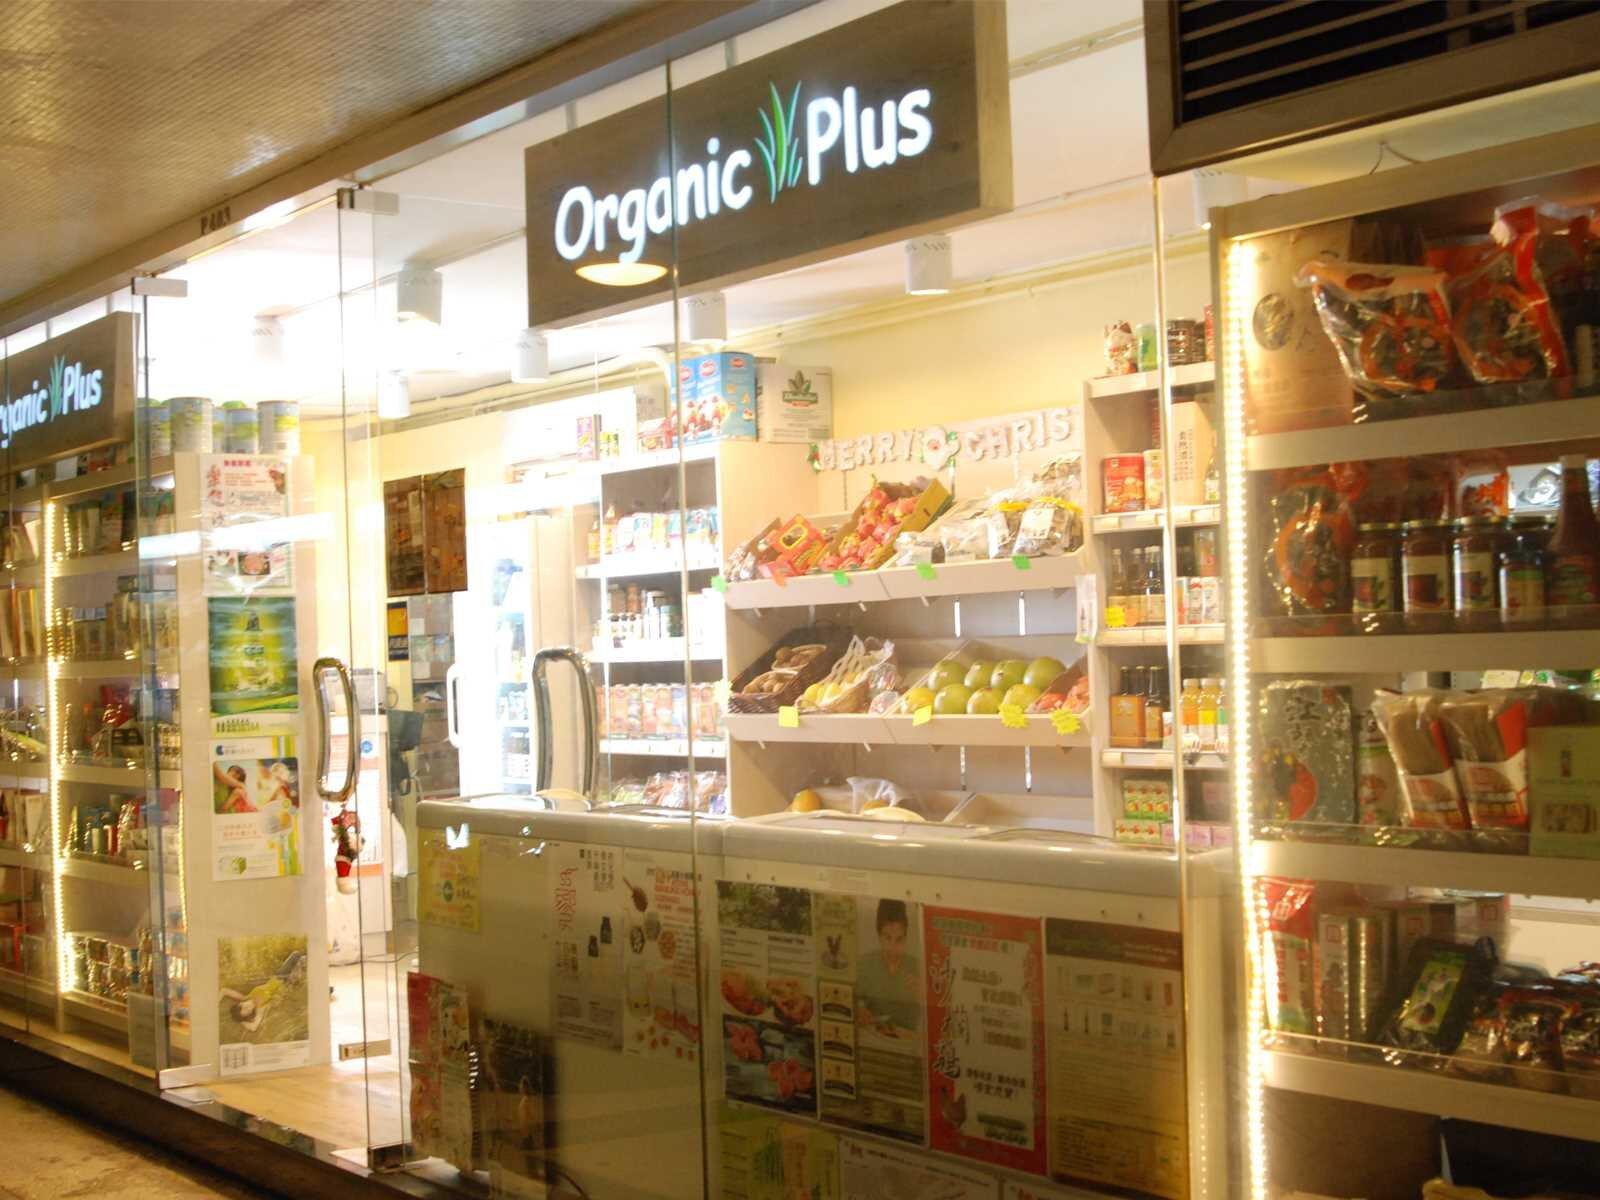 Organic Plus   Taikoo Shing Shop  Business Hours:10am-8pm Mobile:2833 6298 Email:tks@organicplus.com.hk Address:Shop P403, Podium Floor, Yen Kung Mansion,  Taikoo Shing, H.K.